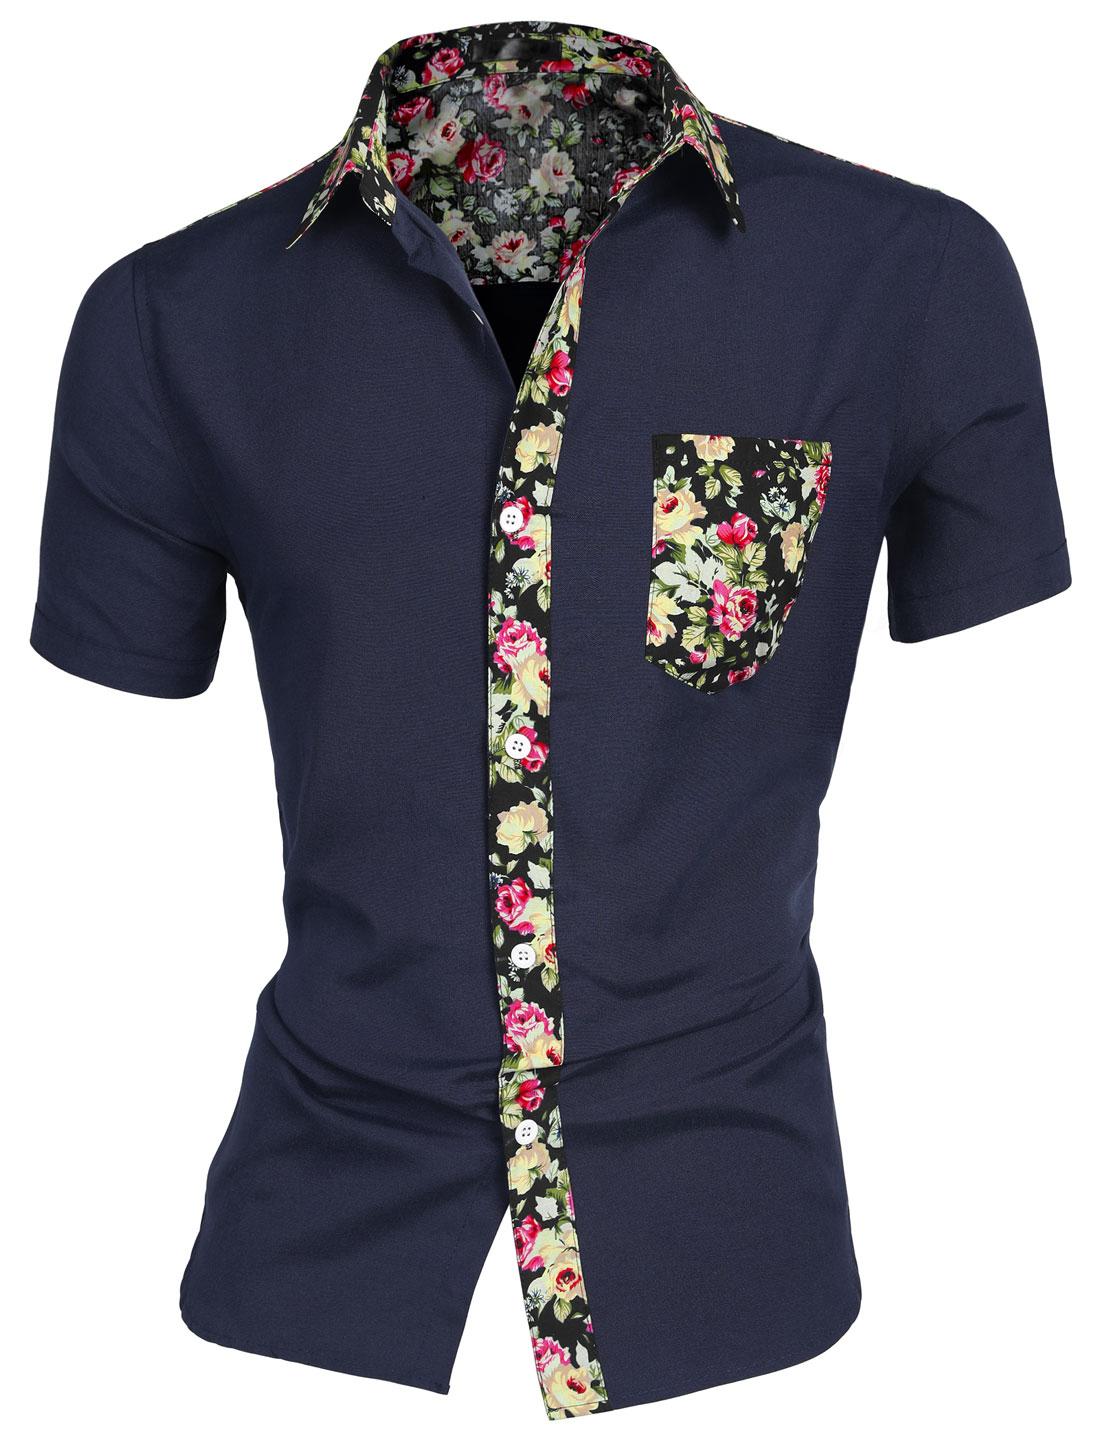 Men Floral Pocket Short Sleeve Button Down Casual Hawaiian Shirt Navy Blue M